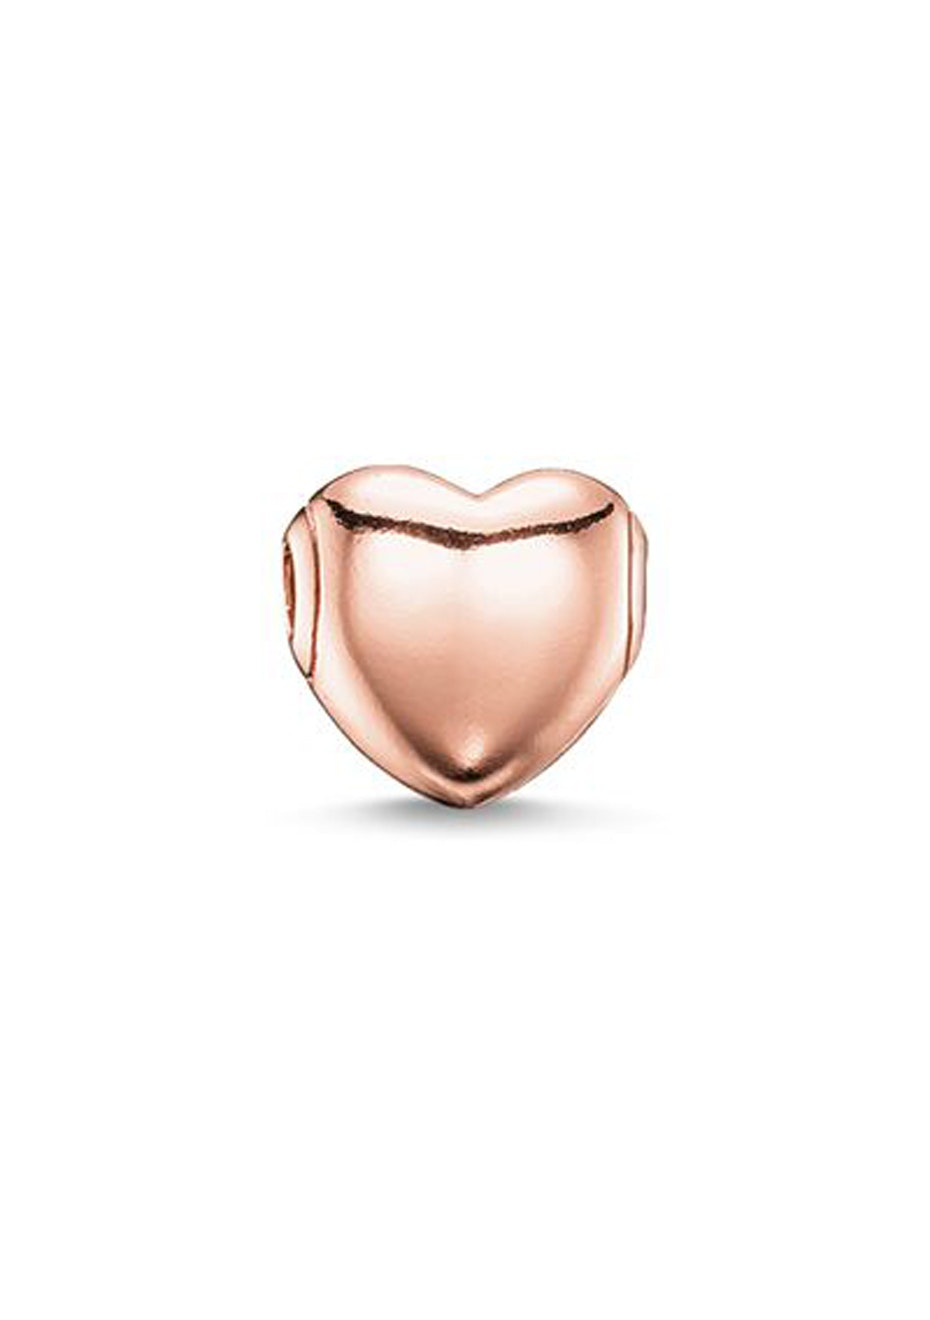 Thomas Sabo  - Karma Bead - Rose Gold Plated Heart Karma Bead